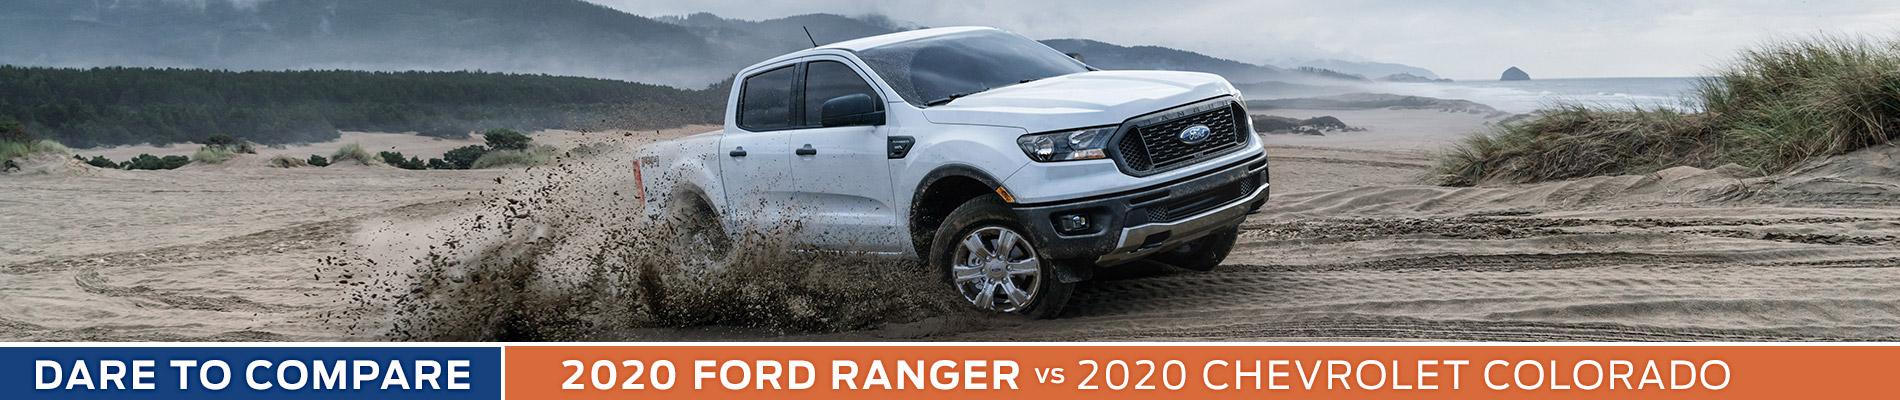 2020 Ford Ranger vs Chevy Colorado - Sun State Ford - Orlando, FL